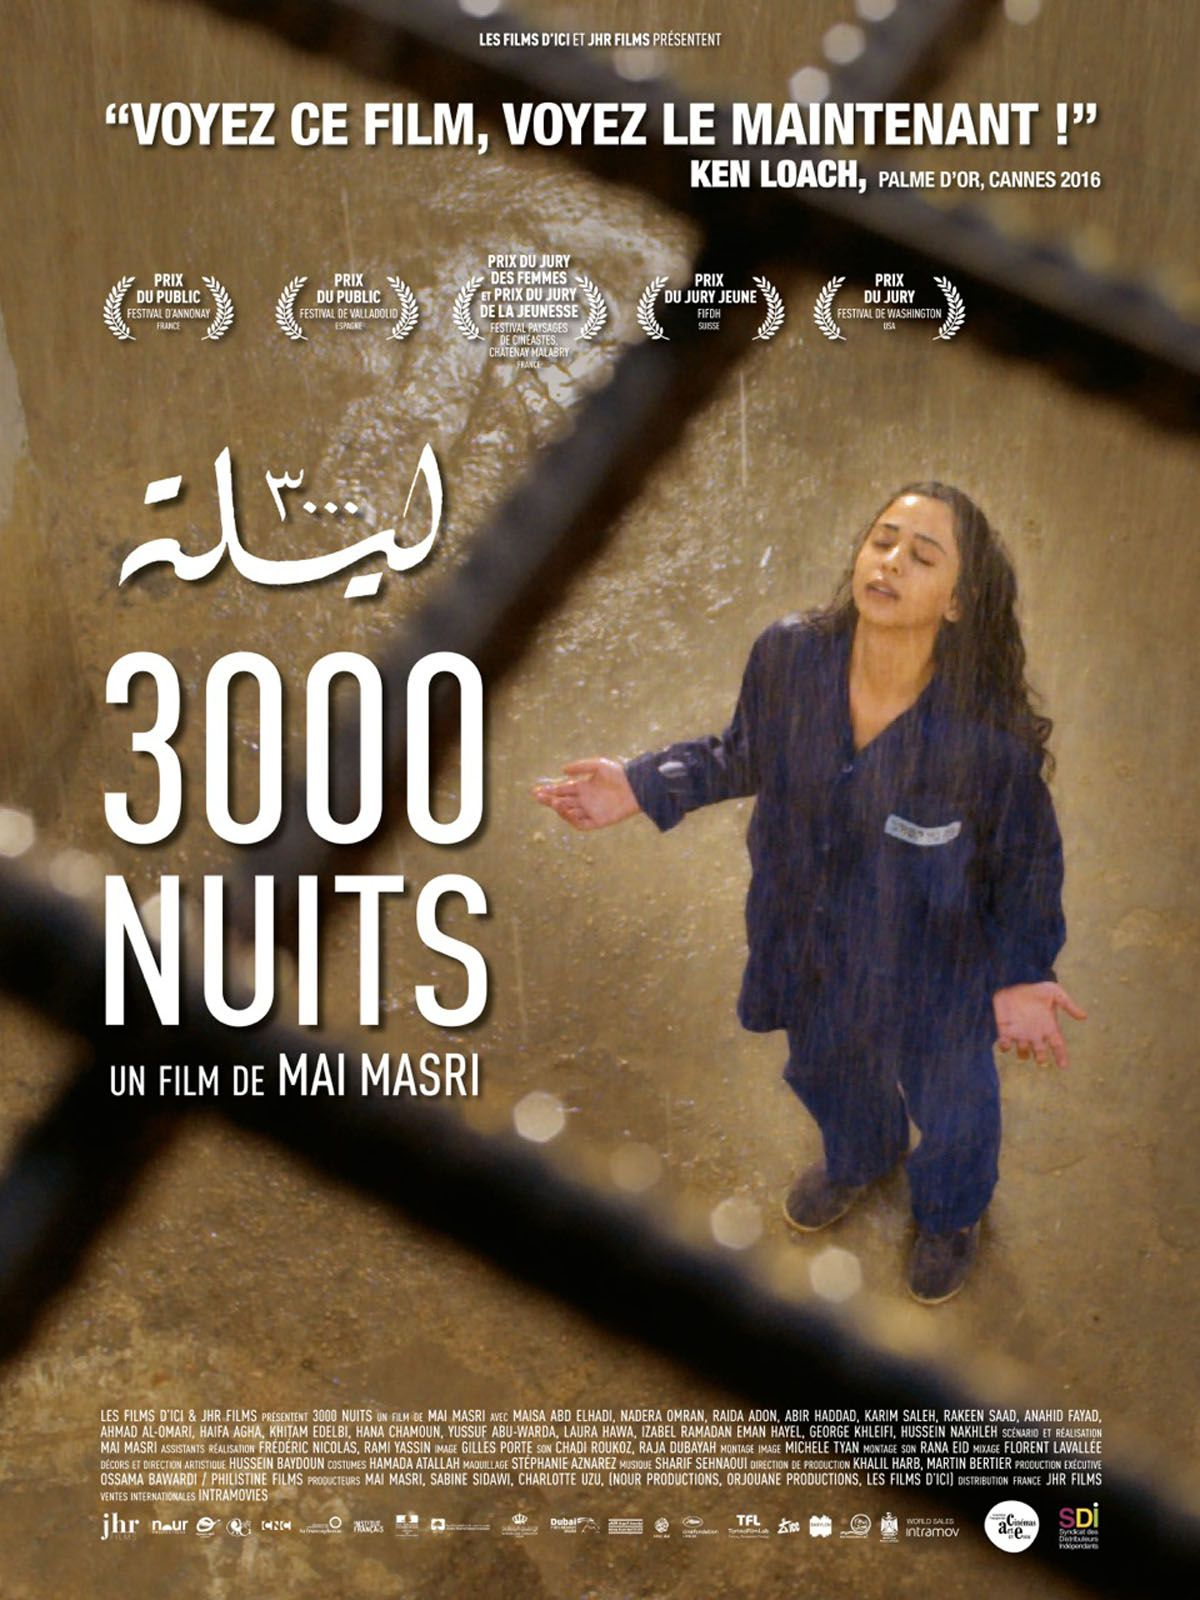 3000 nuits - Film (2017)